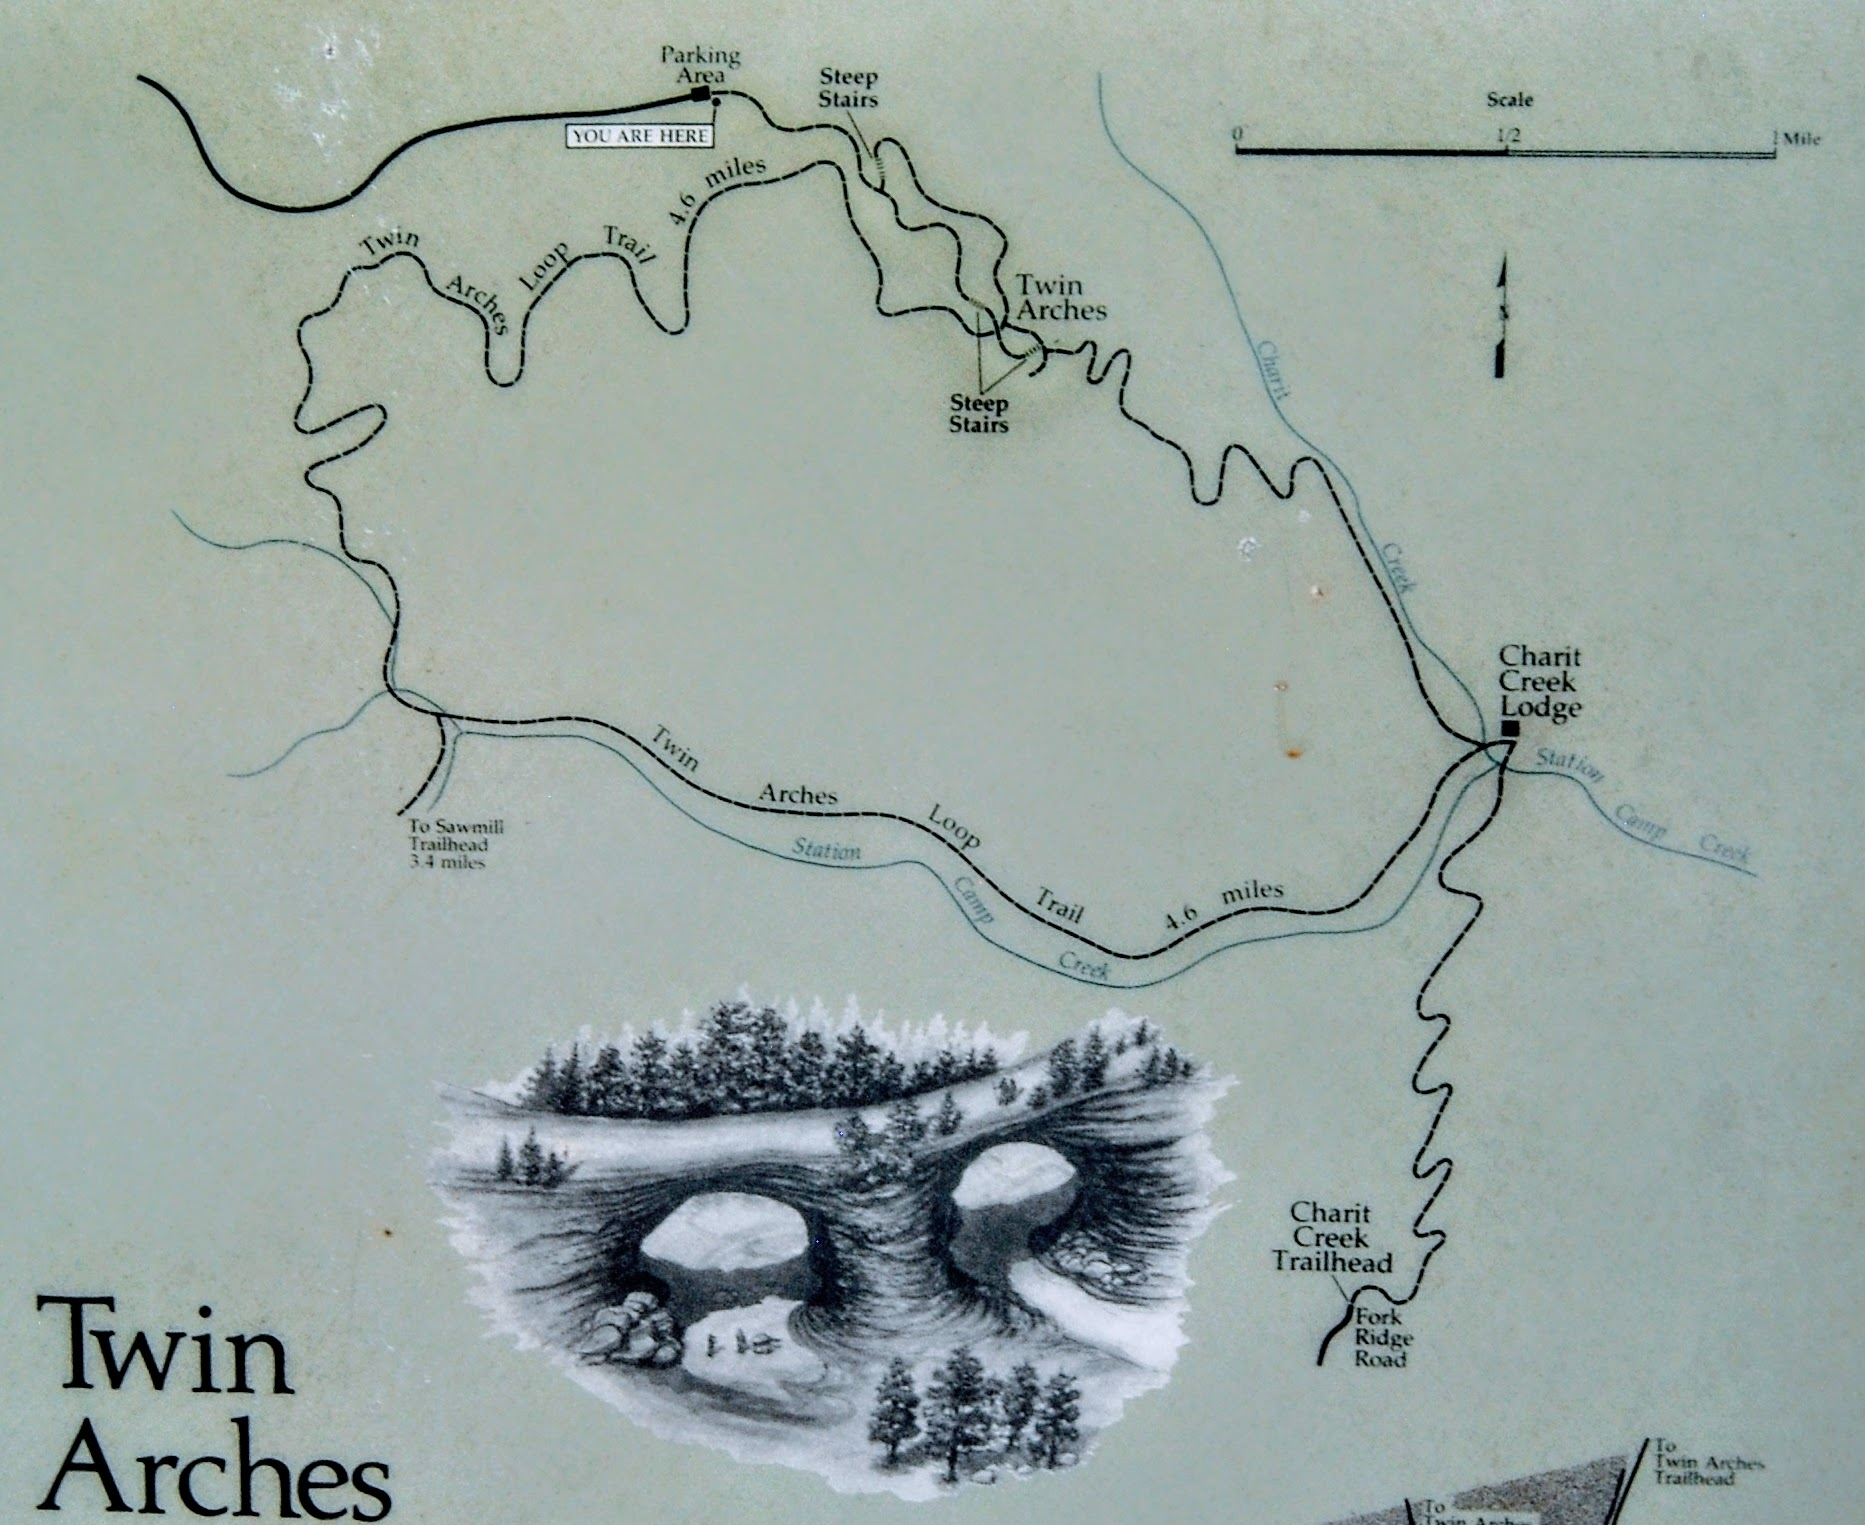 twin-arches-trail-map.JPG